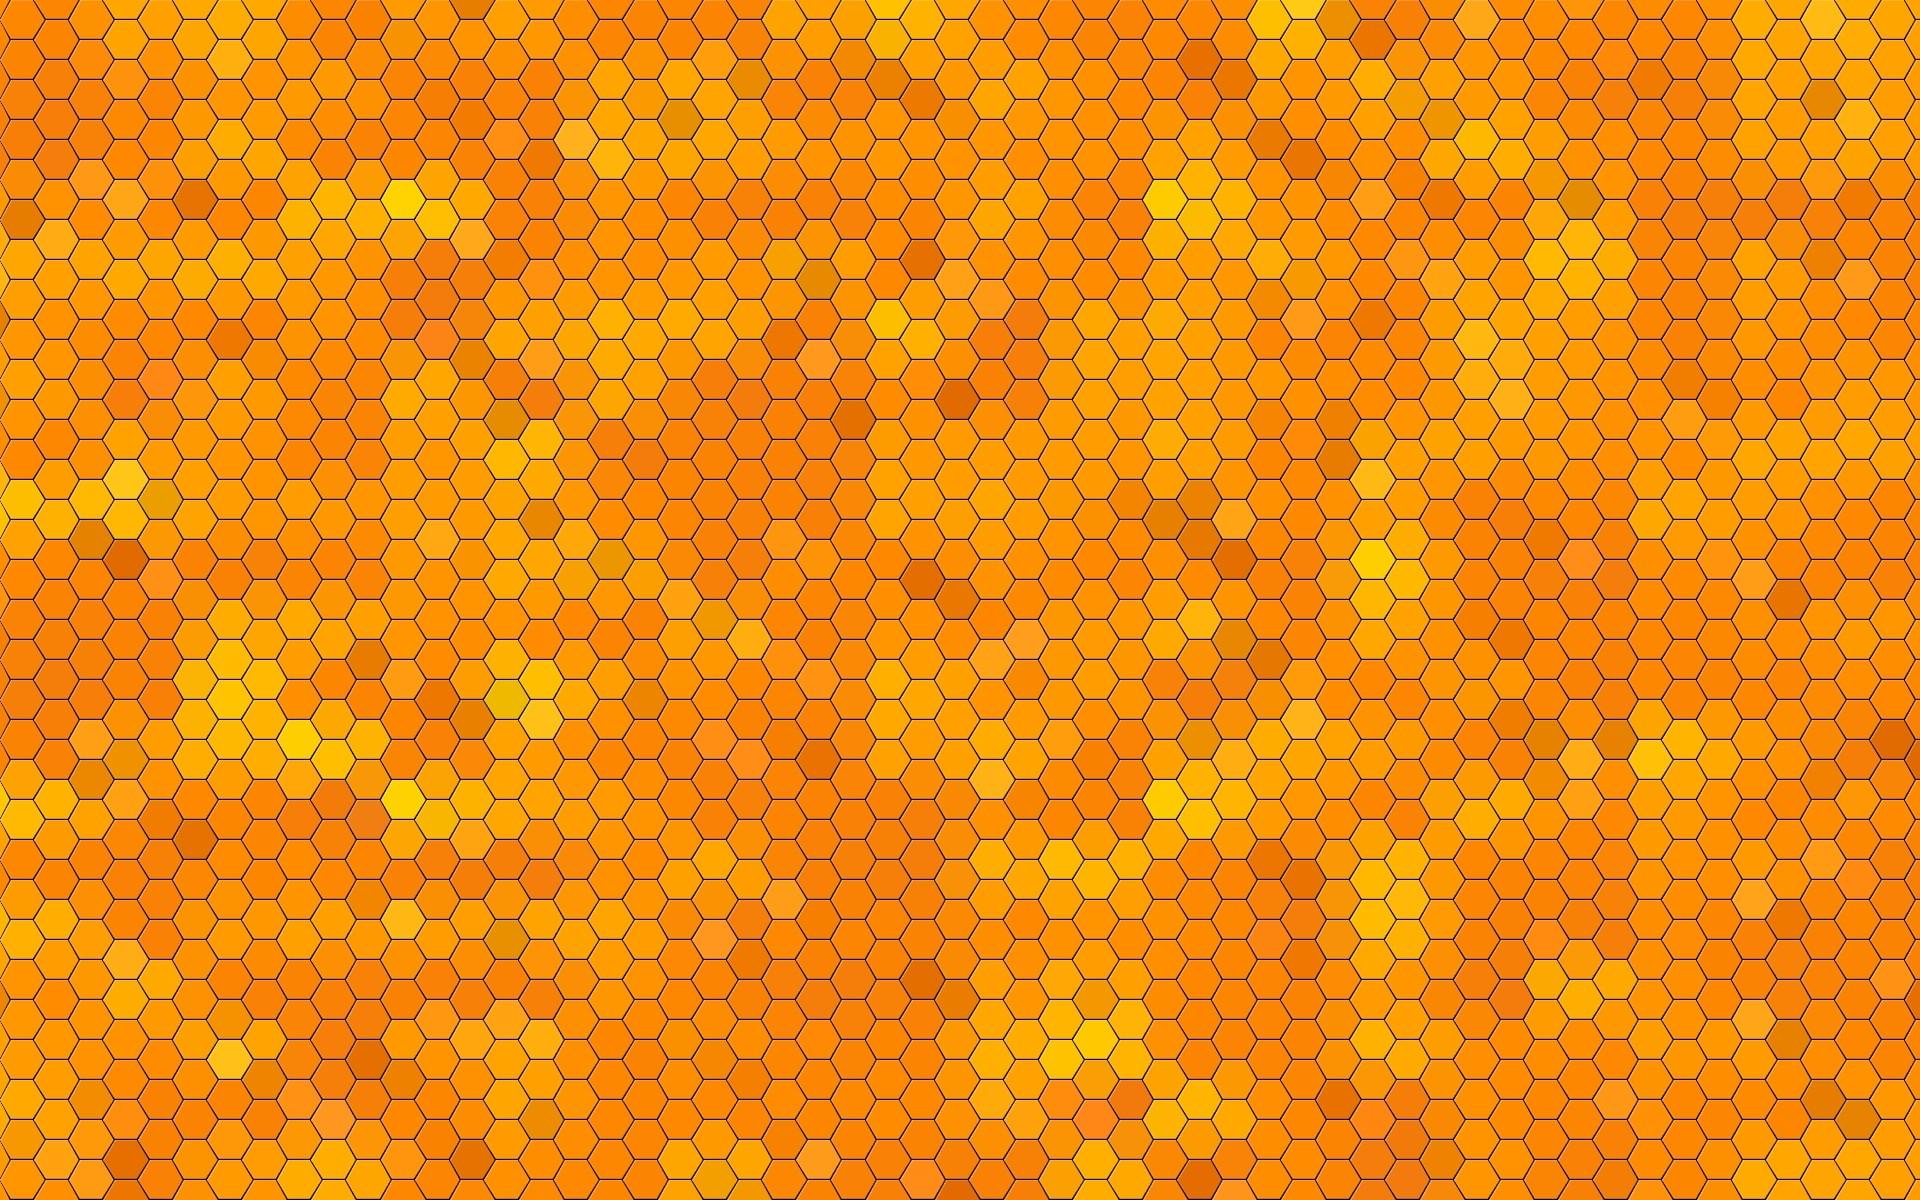 General 1920x1200 honeypad texture orange yellow hexagon beehive patterns digital art